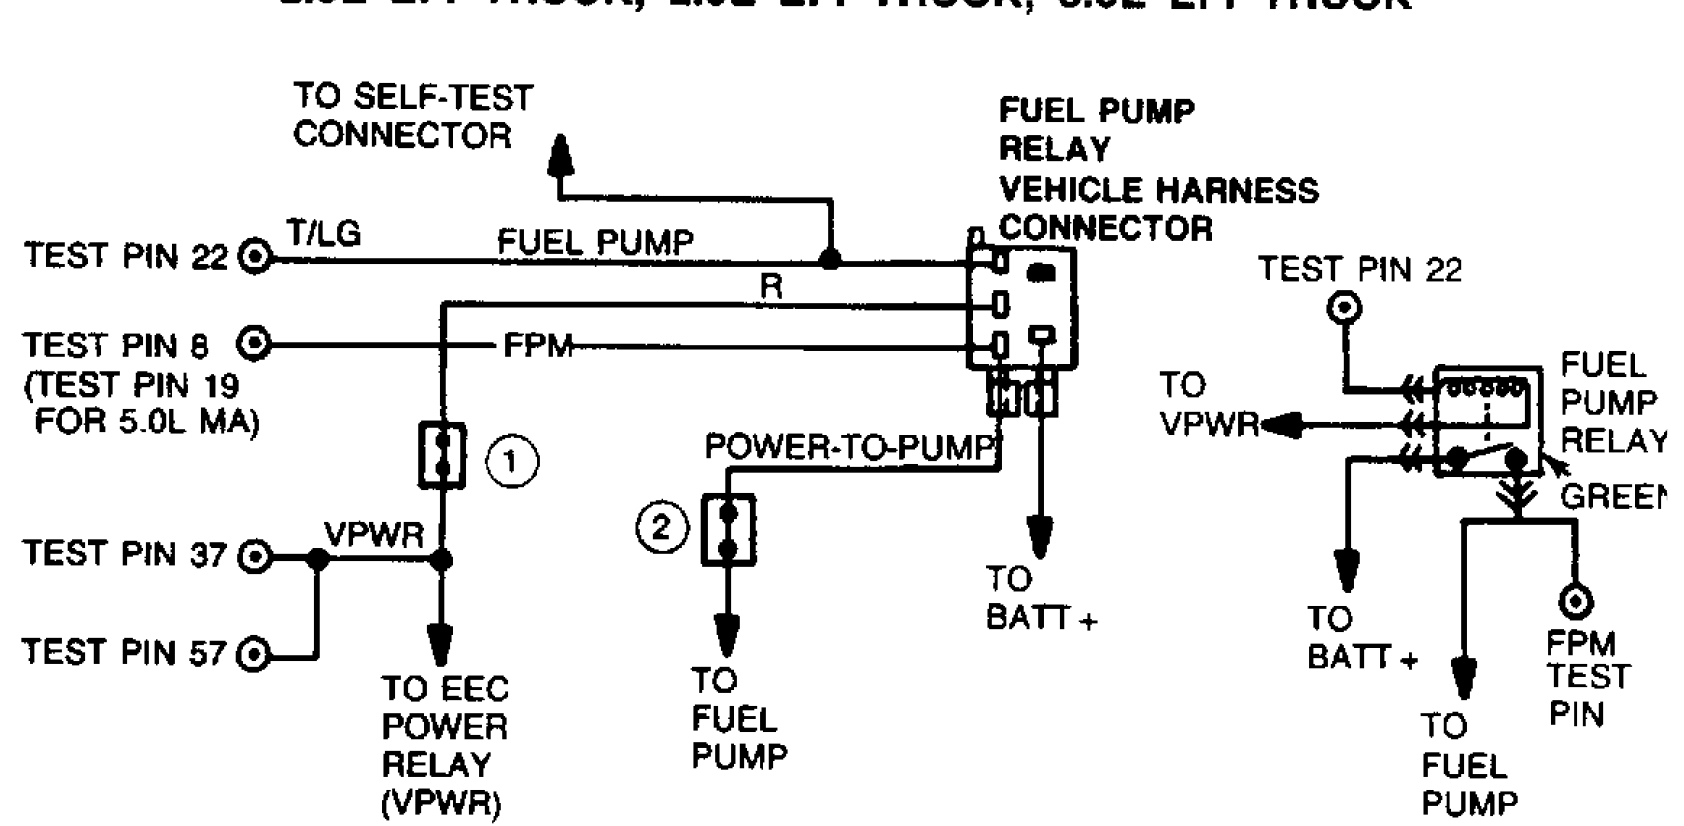 Fuel Pump Wiring Wiring Harness Wiring Diagram Wiring